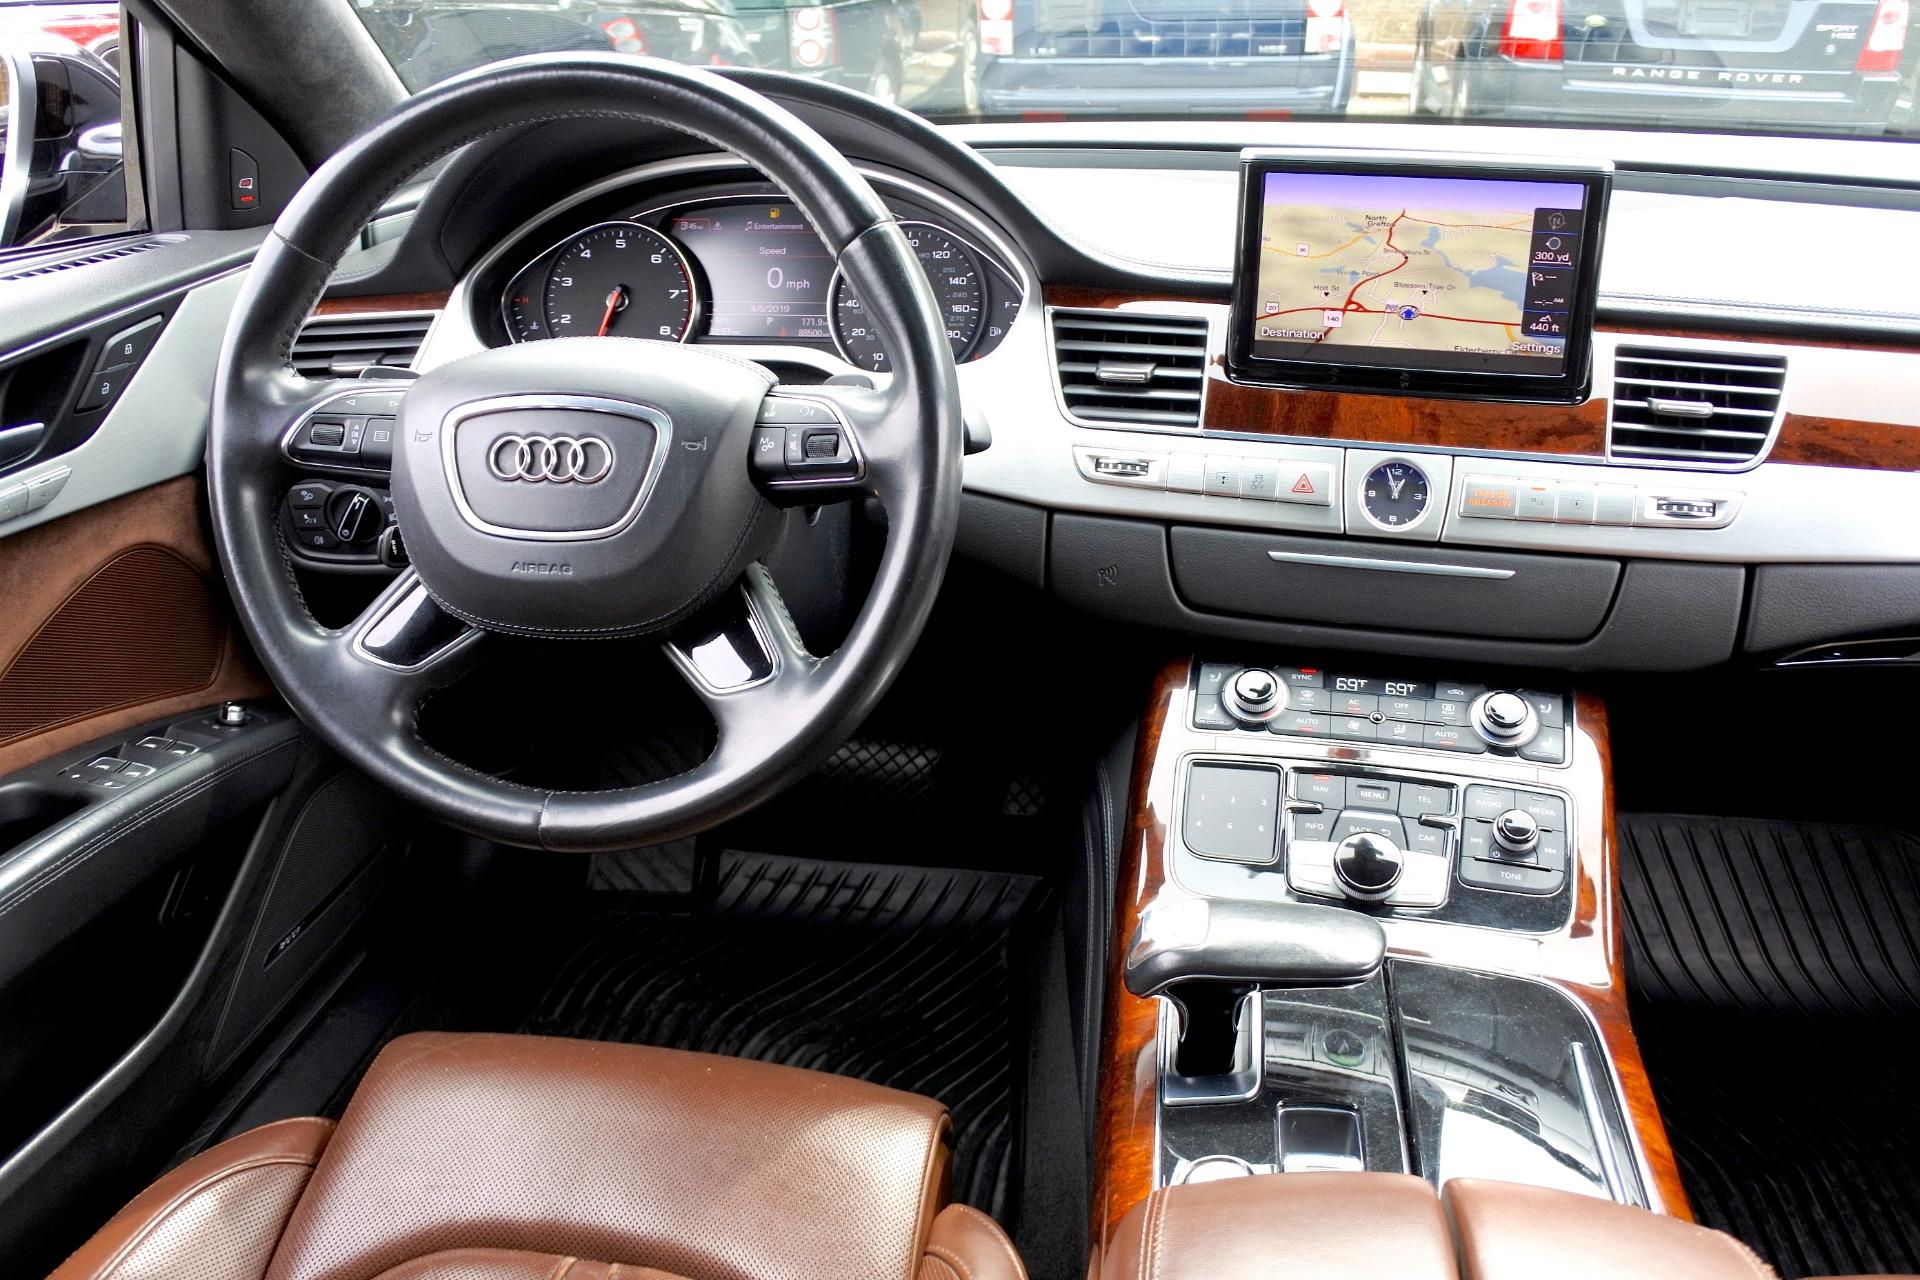 Used 2012 Audi A8 l W12 Quattro Used 2012 Audi A8 l W12 Quattro for sale  at Metro West Motorcars LLC in Shrewsbury MA 10